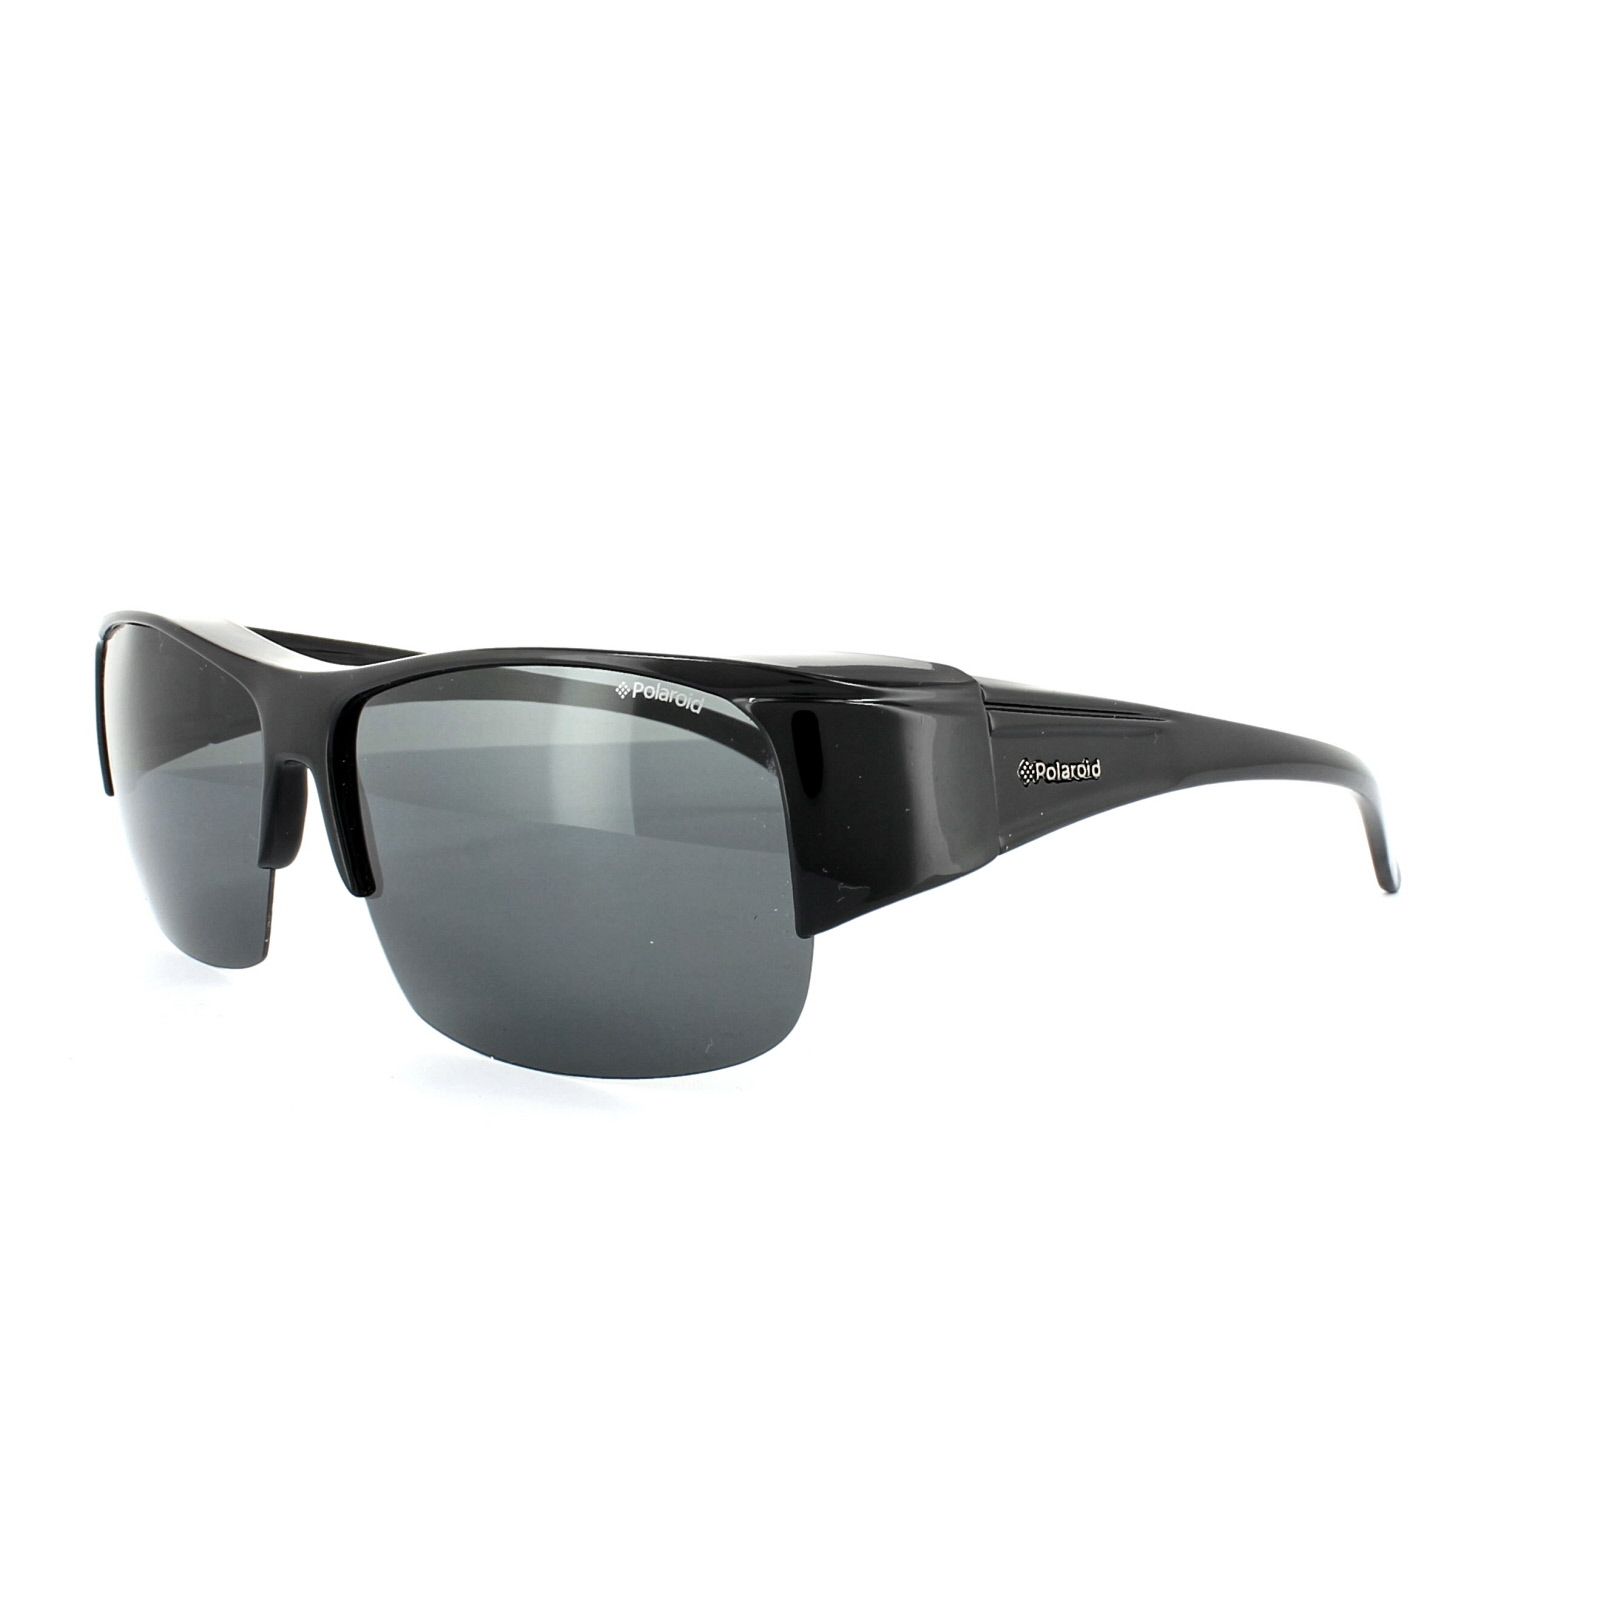 Cheap Polaroid Suncovers Fitover P8405 Sunglasses ...